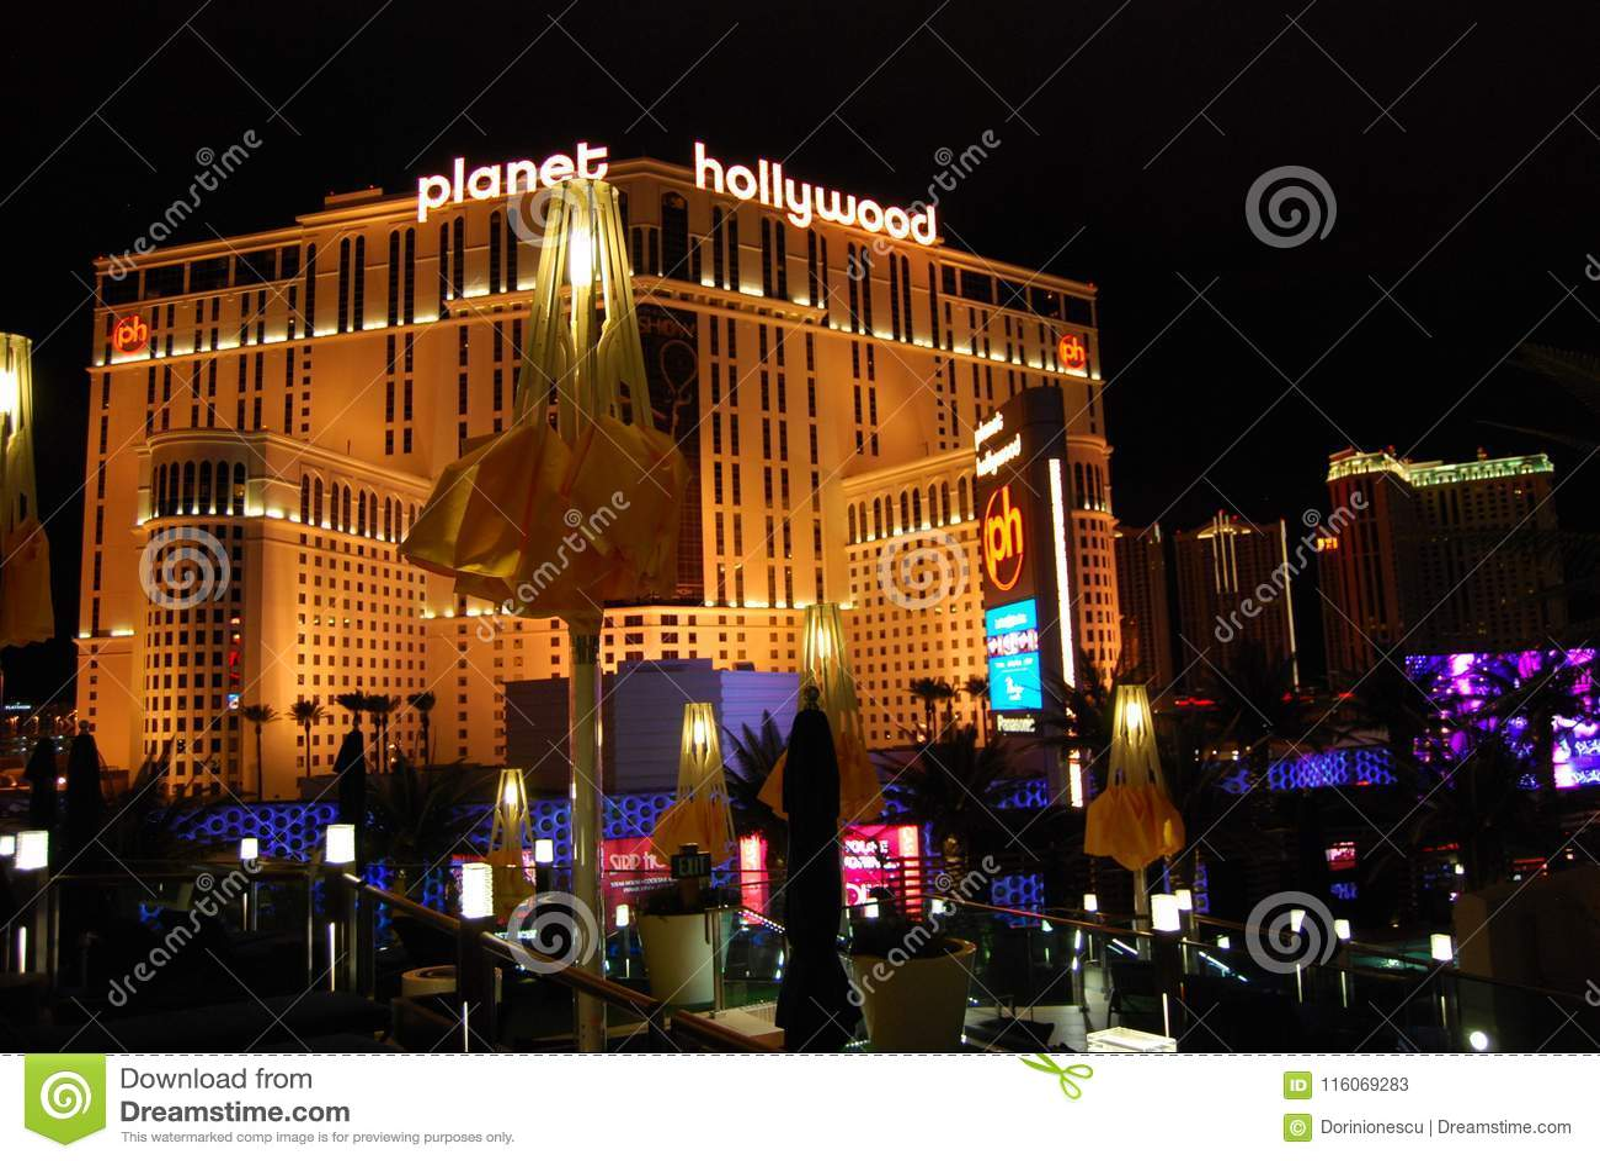 Гостиница Парижа и казино, Лас-Вегас, курорт Голливуда планеты и казино, Лас-Вегас, ноча, ориентир ориентир, метрополия, район ме